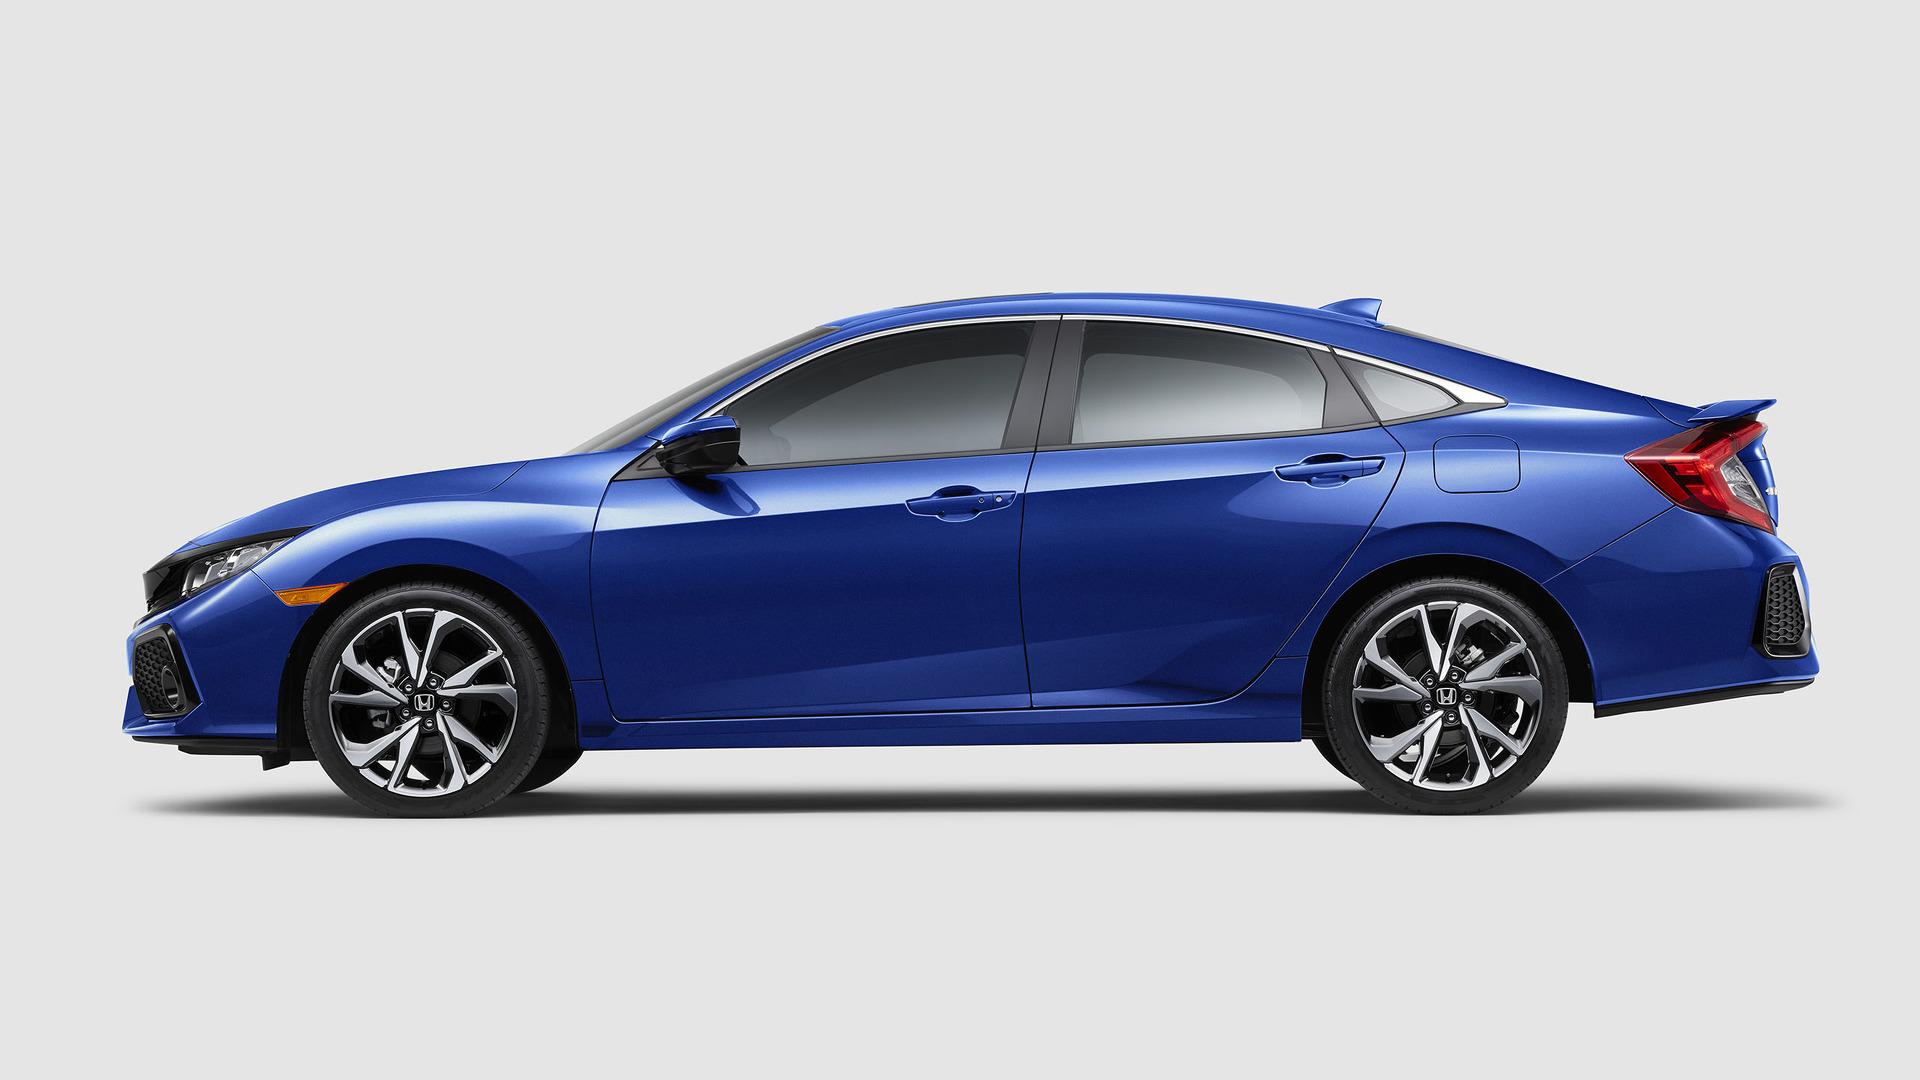 Honda civic si my 2018 5 13 for 2018 honda civic si price